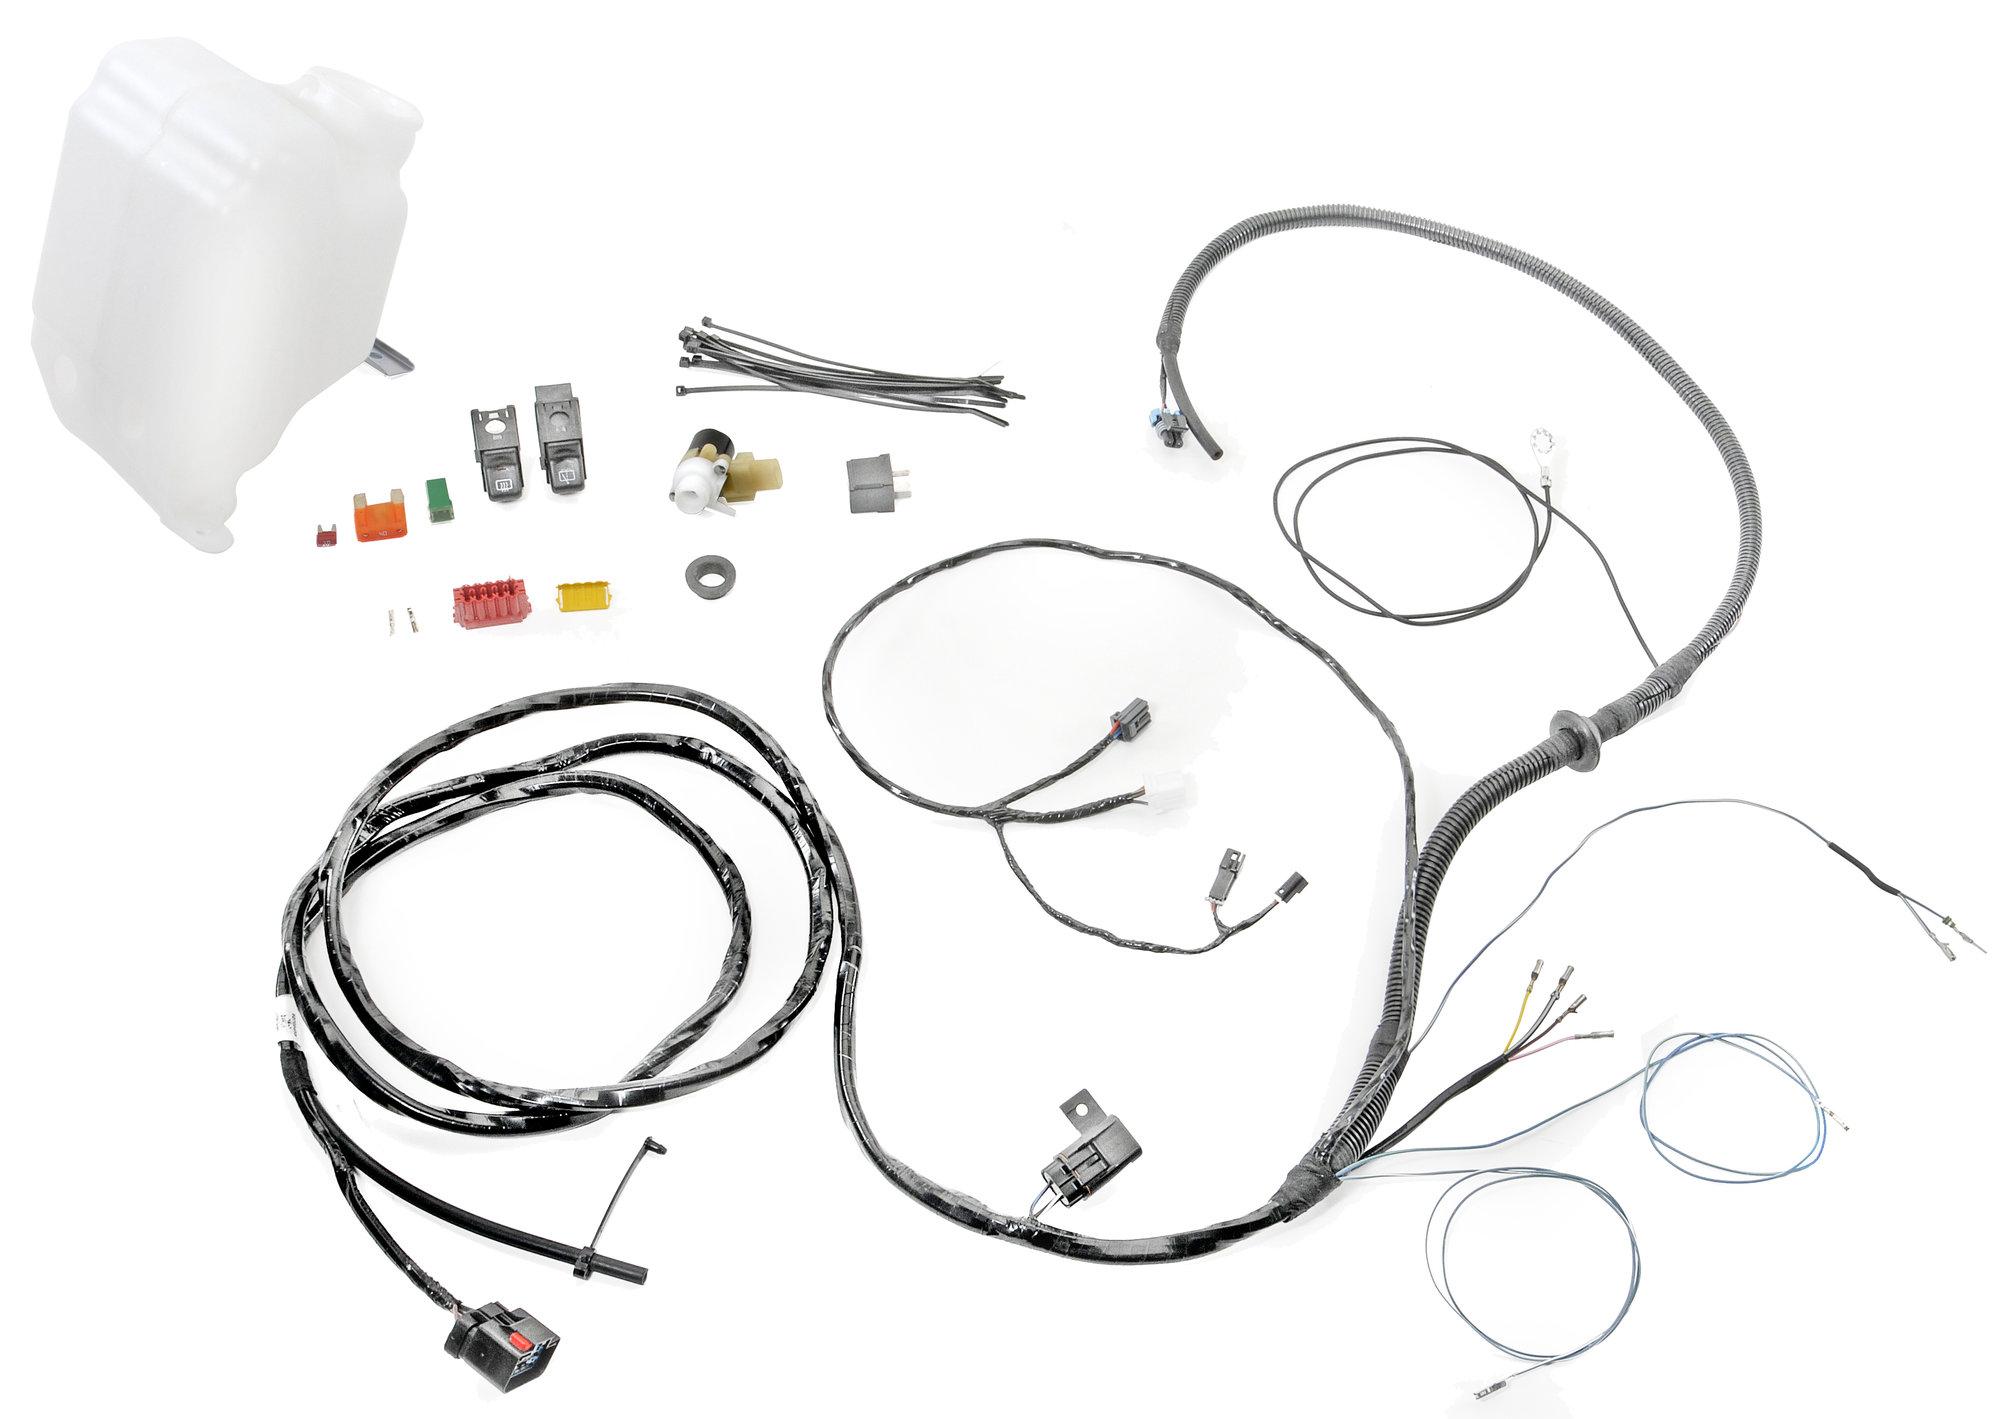 jeep wrangler hardtop wiring adapter harness